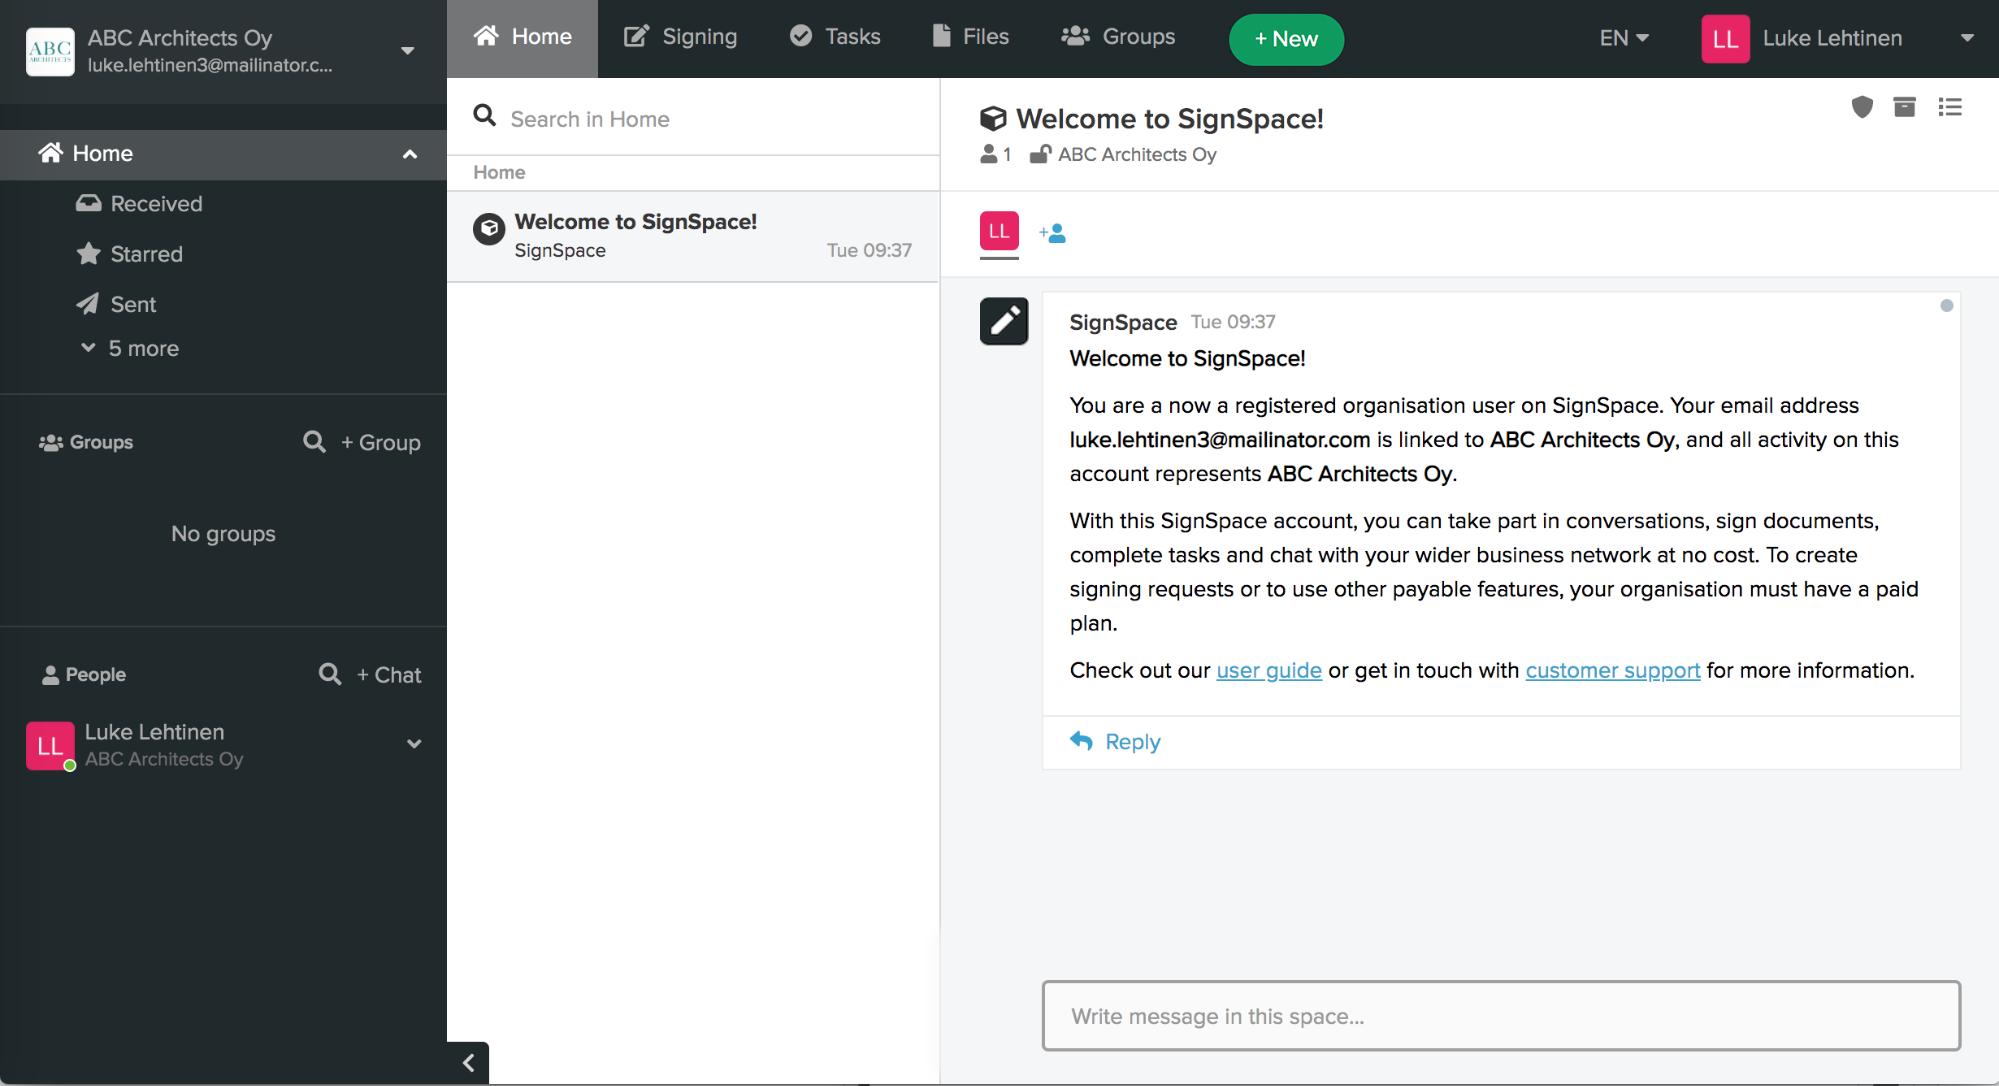 New user invitation form